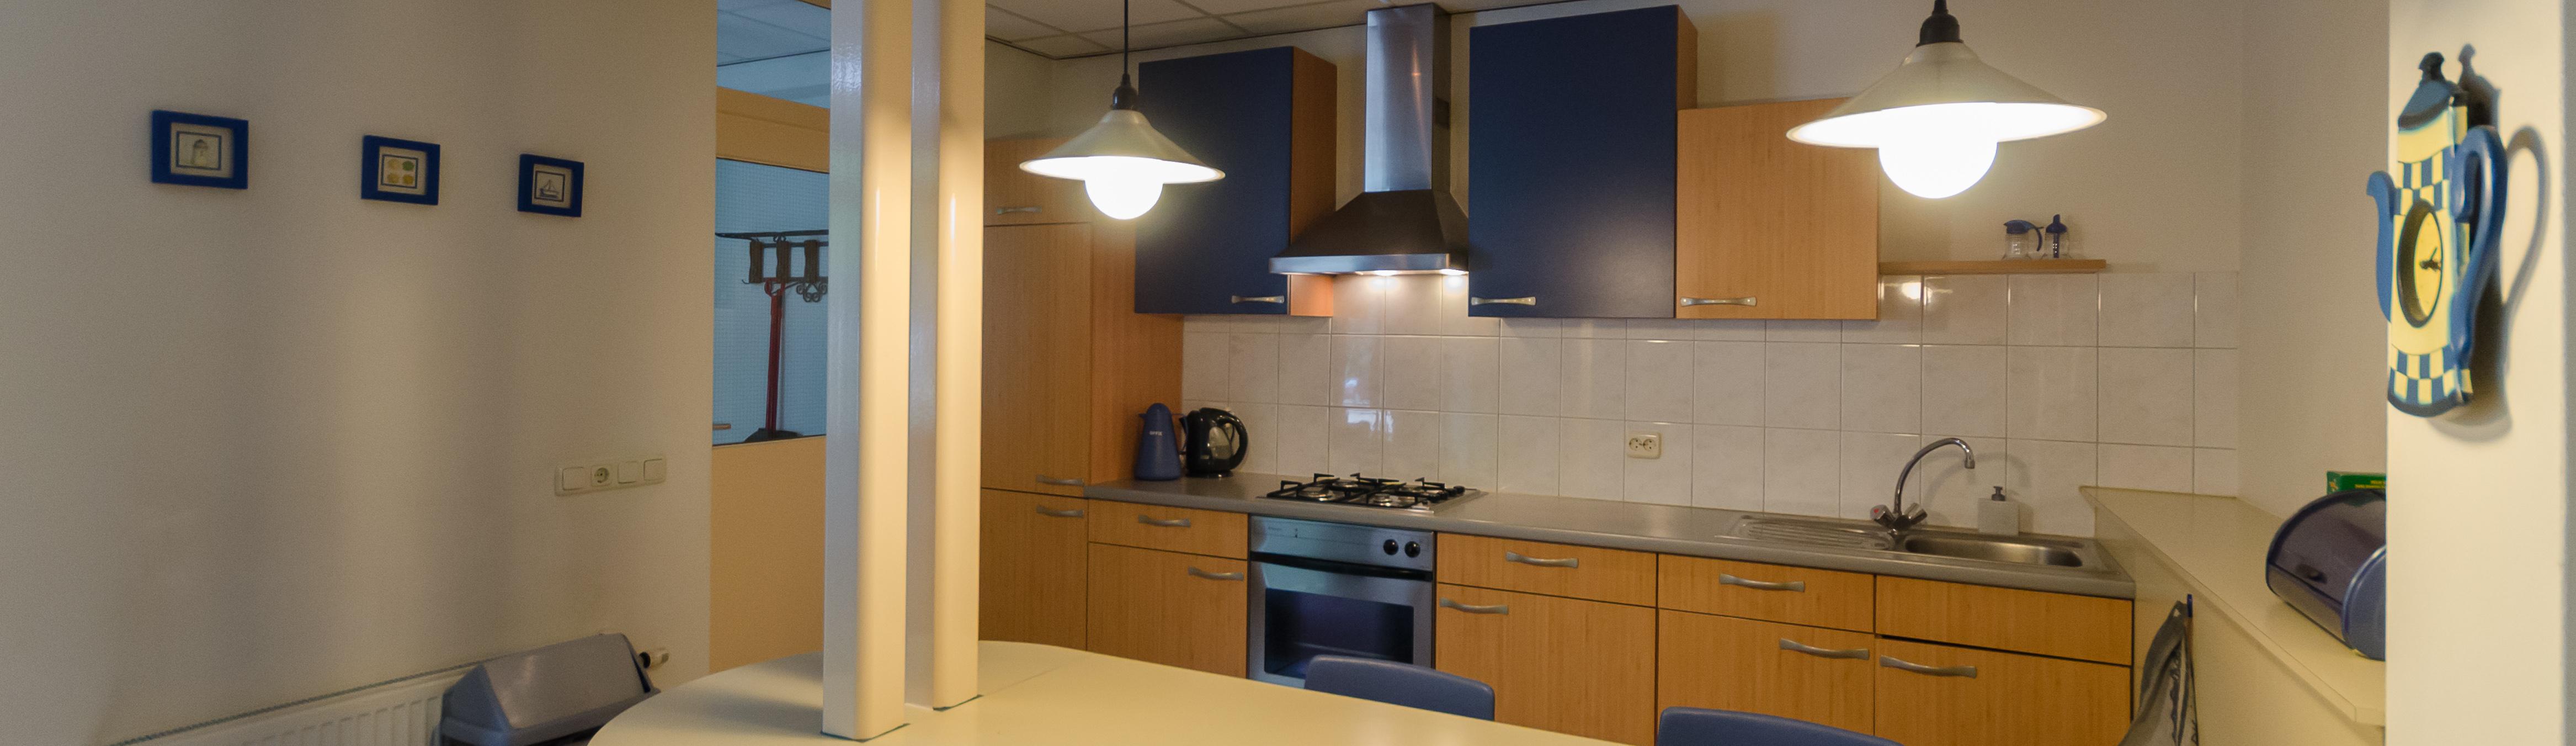 Appartementen 2